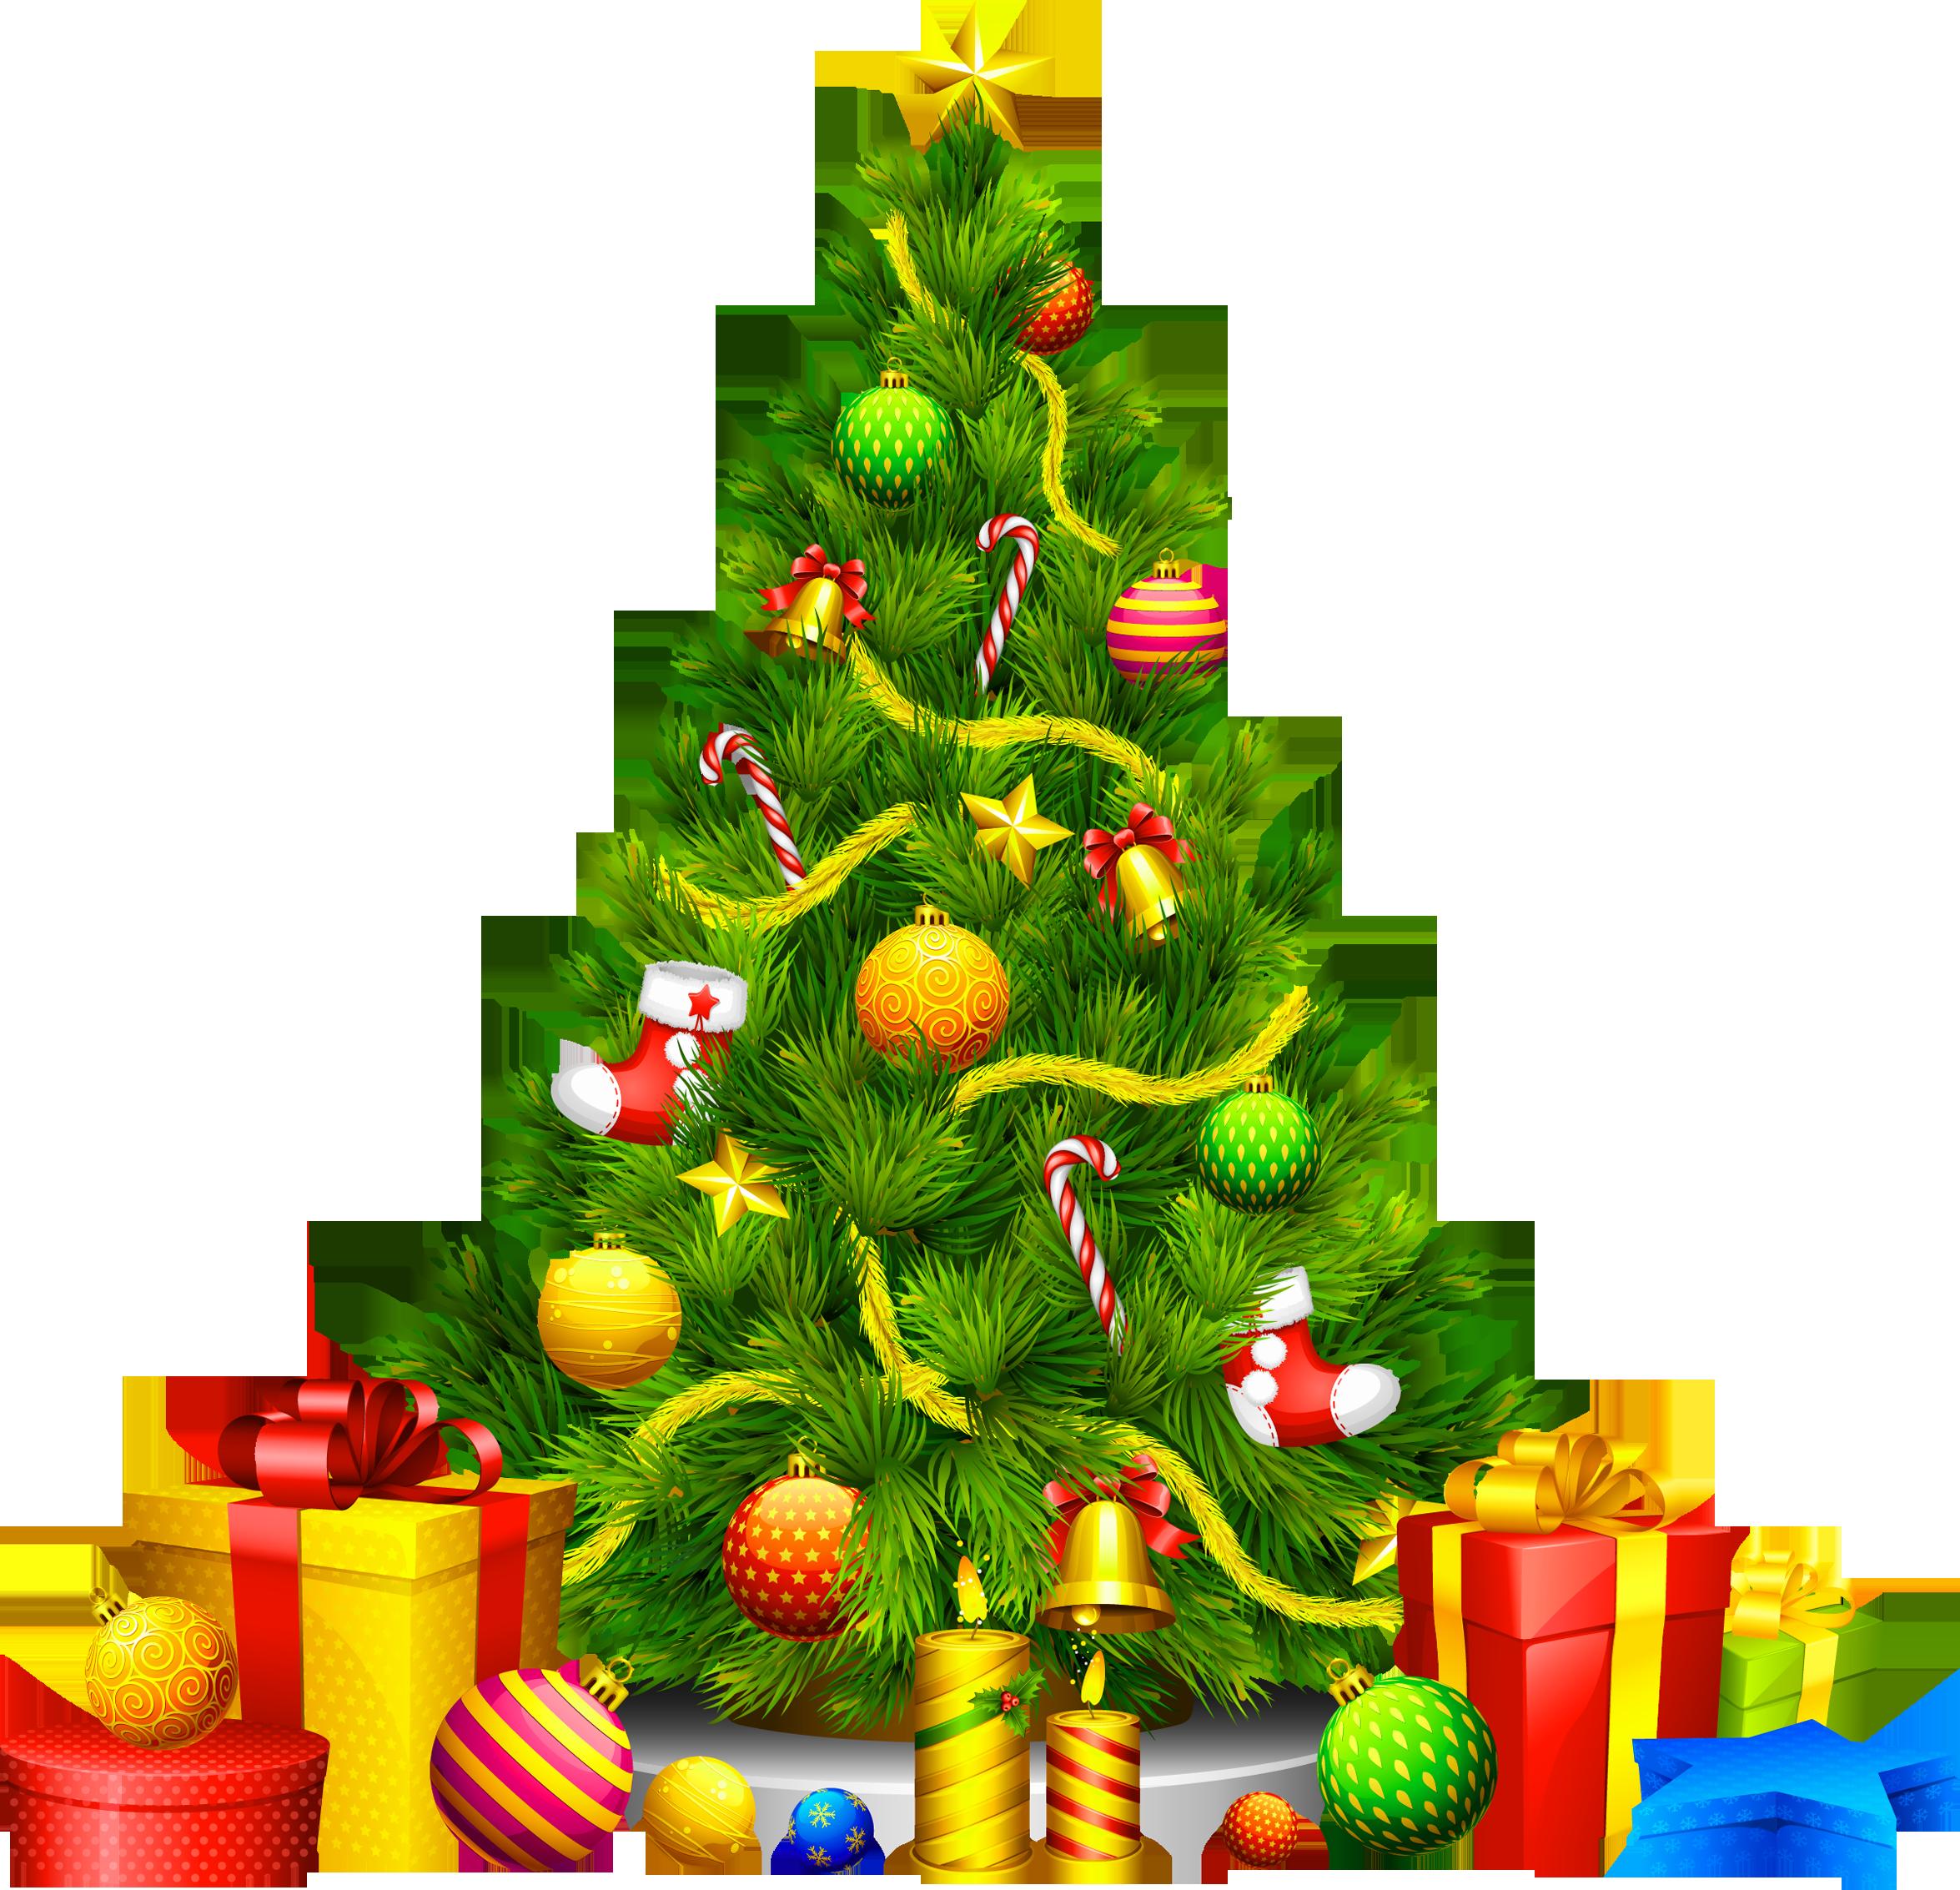 Clip Art Clipart Christmas Tree christma-Clip Art Clipart Christmas Tree christmas tree clip art png clipartfox fir image-16